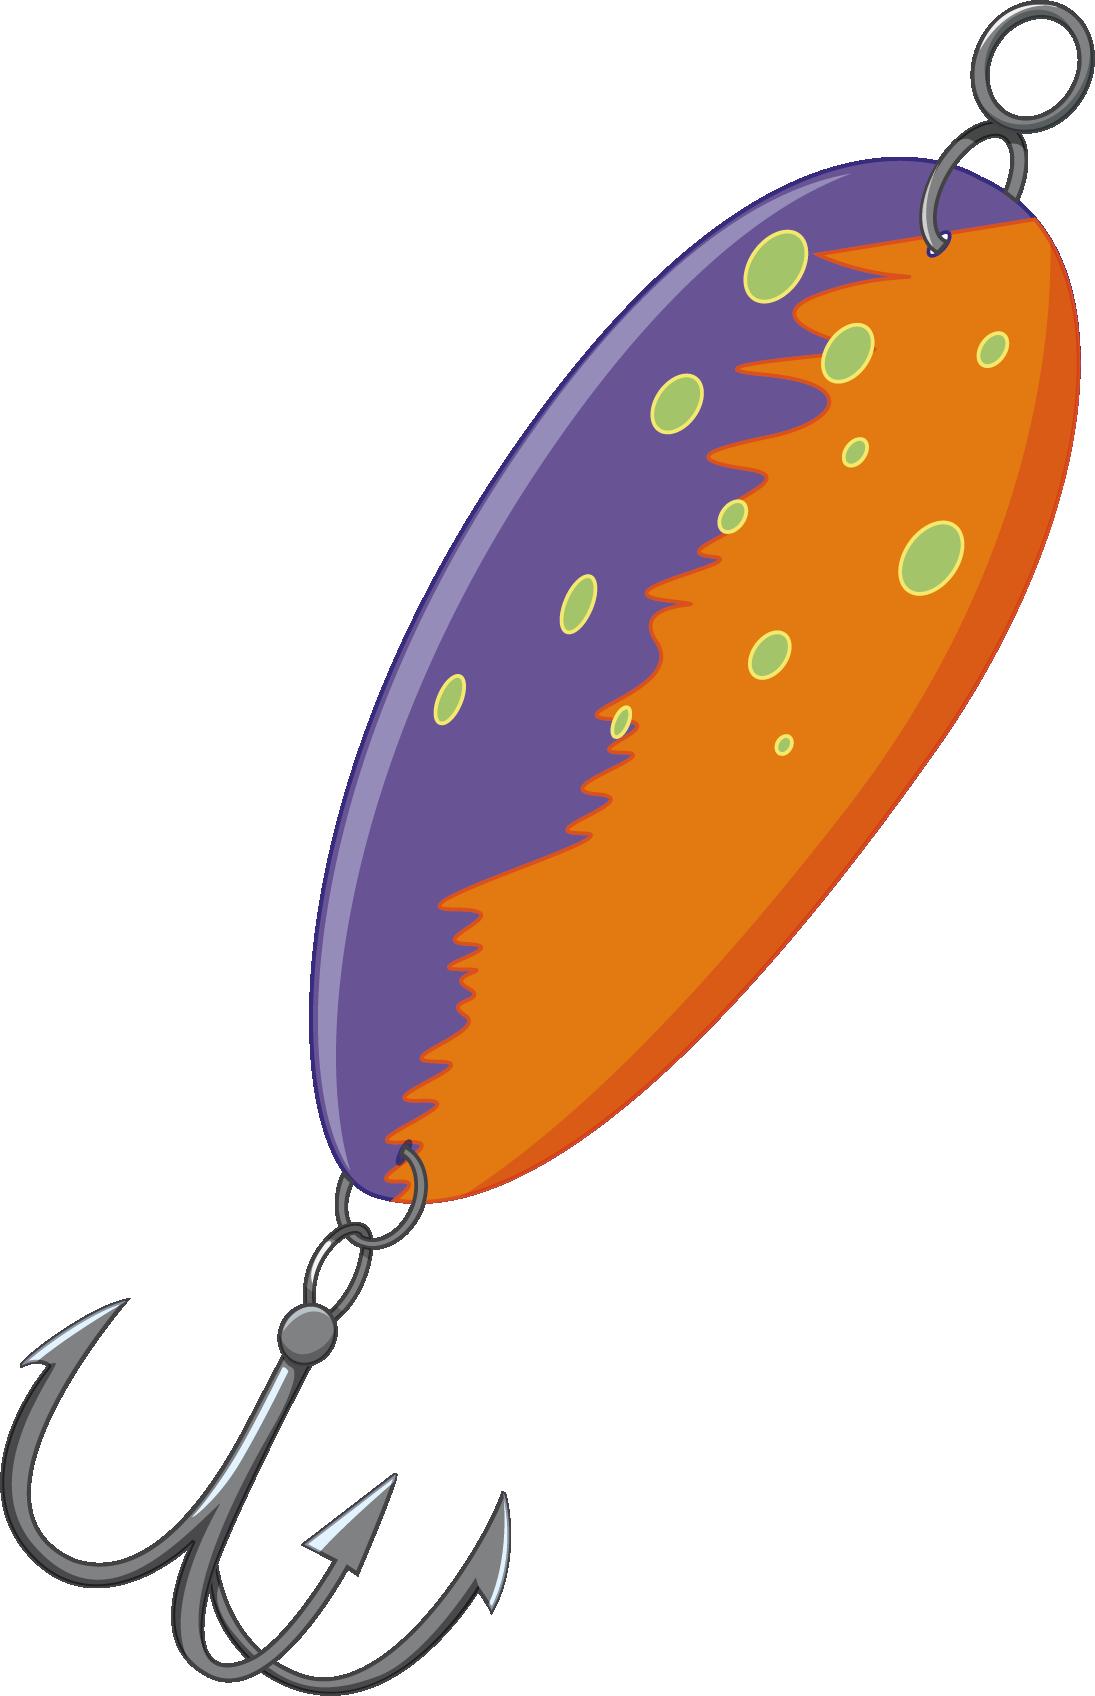 1095x1696 Fishing Baits Amp Lures Fish Hook Clip Art